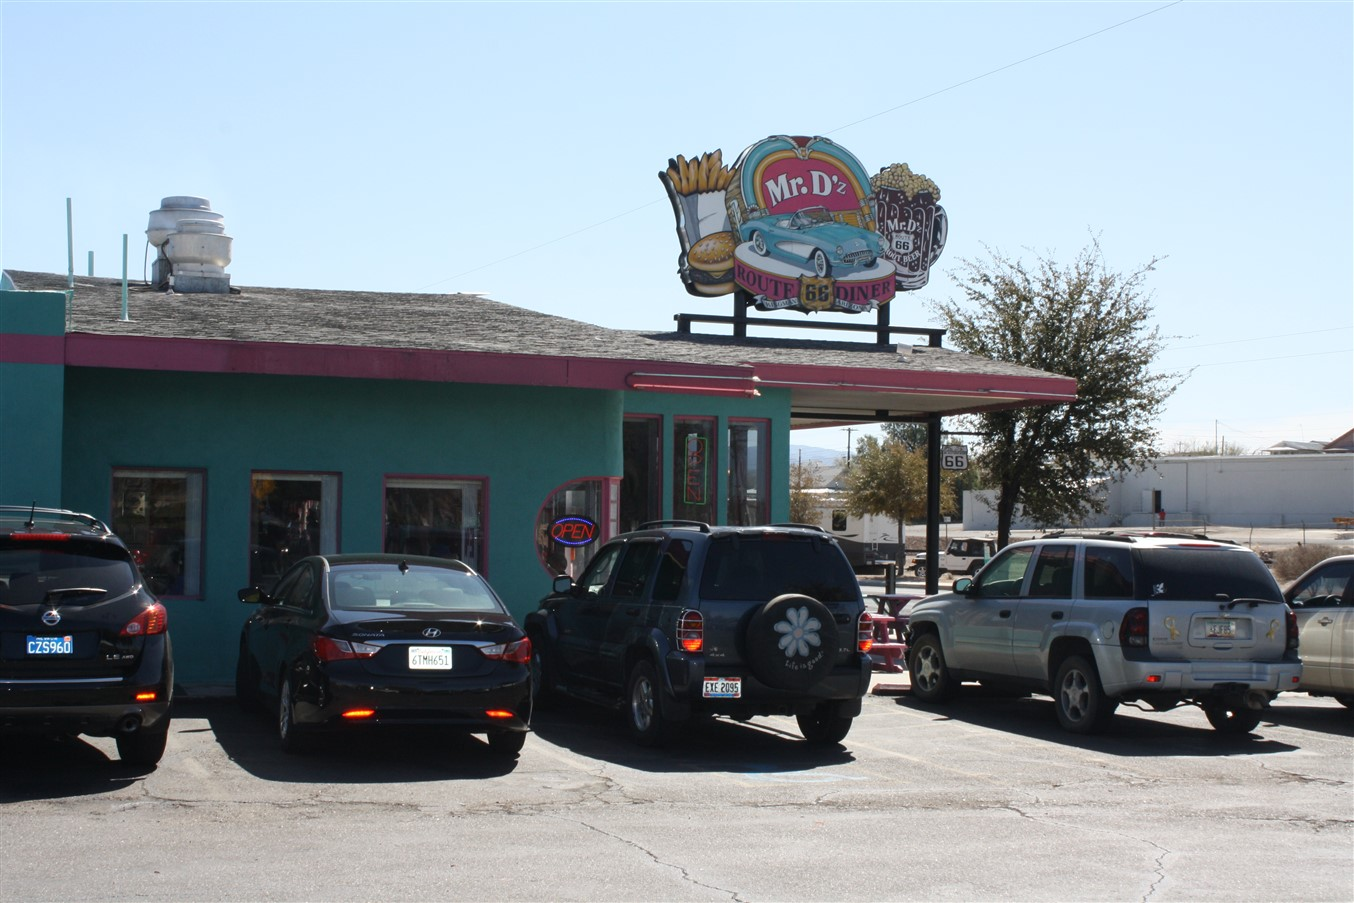 2012 03 14 Route 66 Road Trip 136 Kingman Arizona.jpg